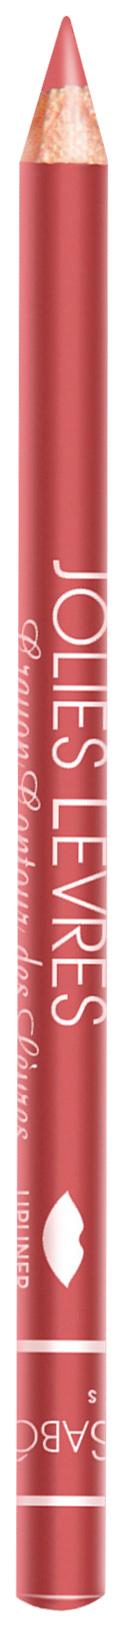 Карандаш для губ Vivienne Sabo Jolies Levres 106 Shade 0,9 гр фото